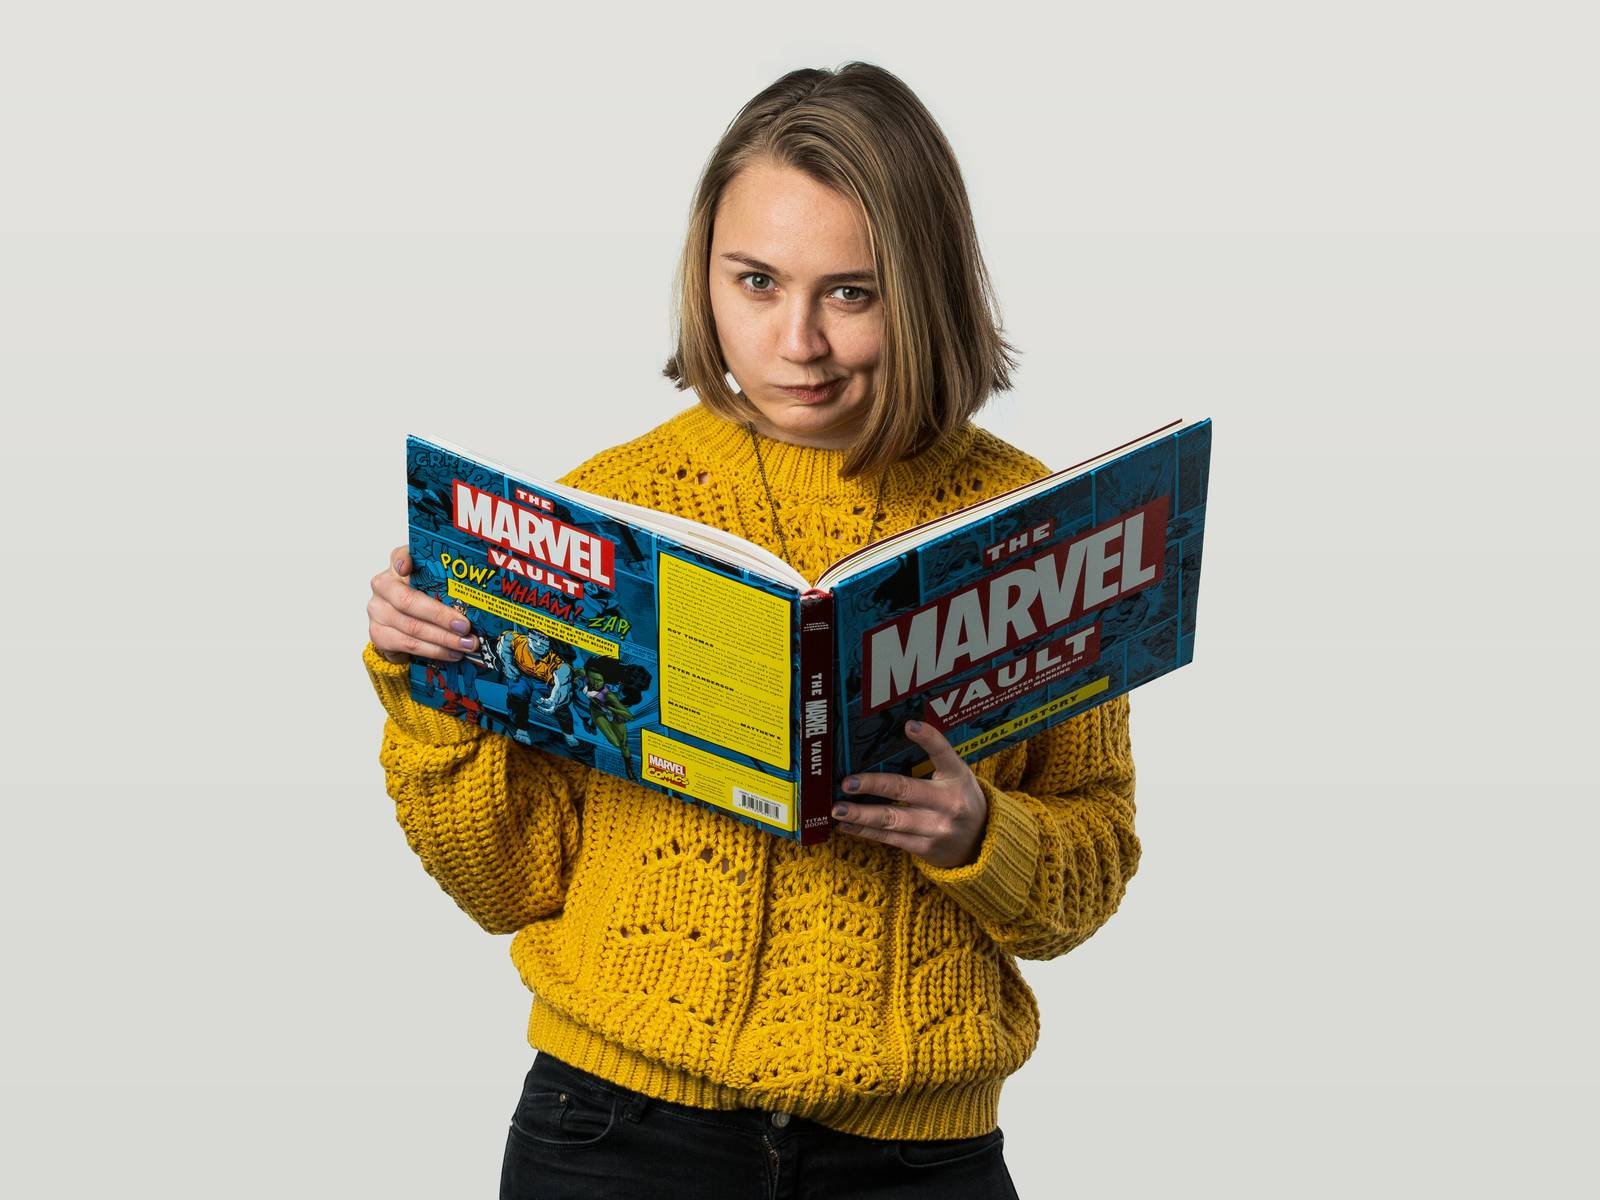 Sofia reading 'The Marvel Vault'